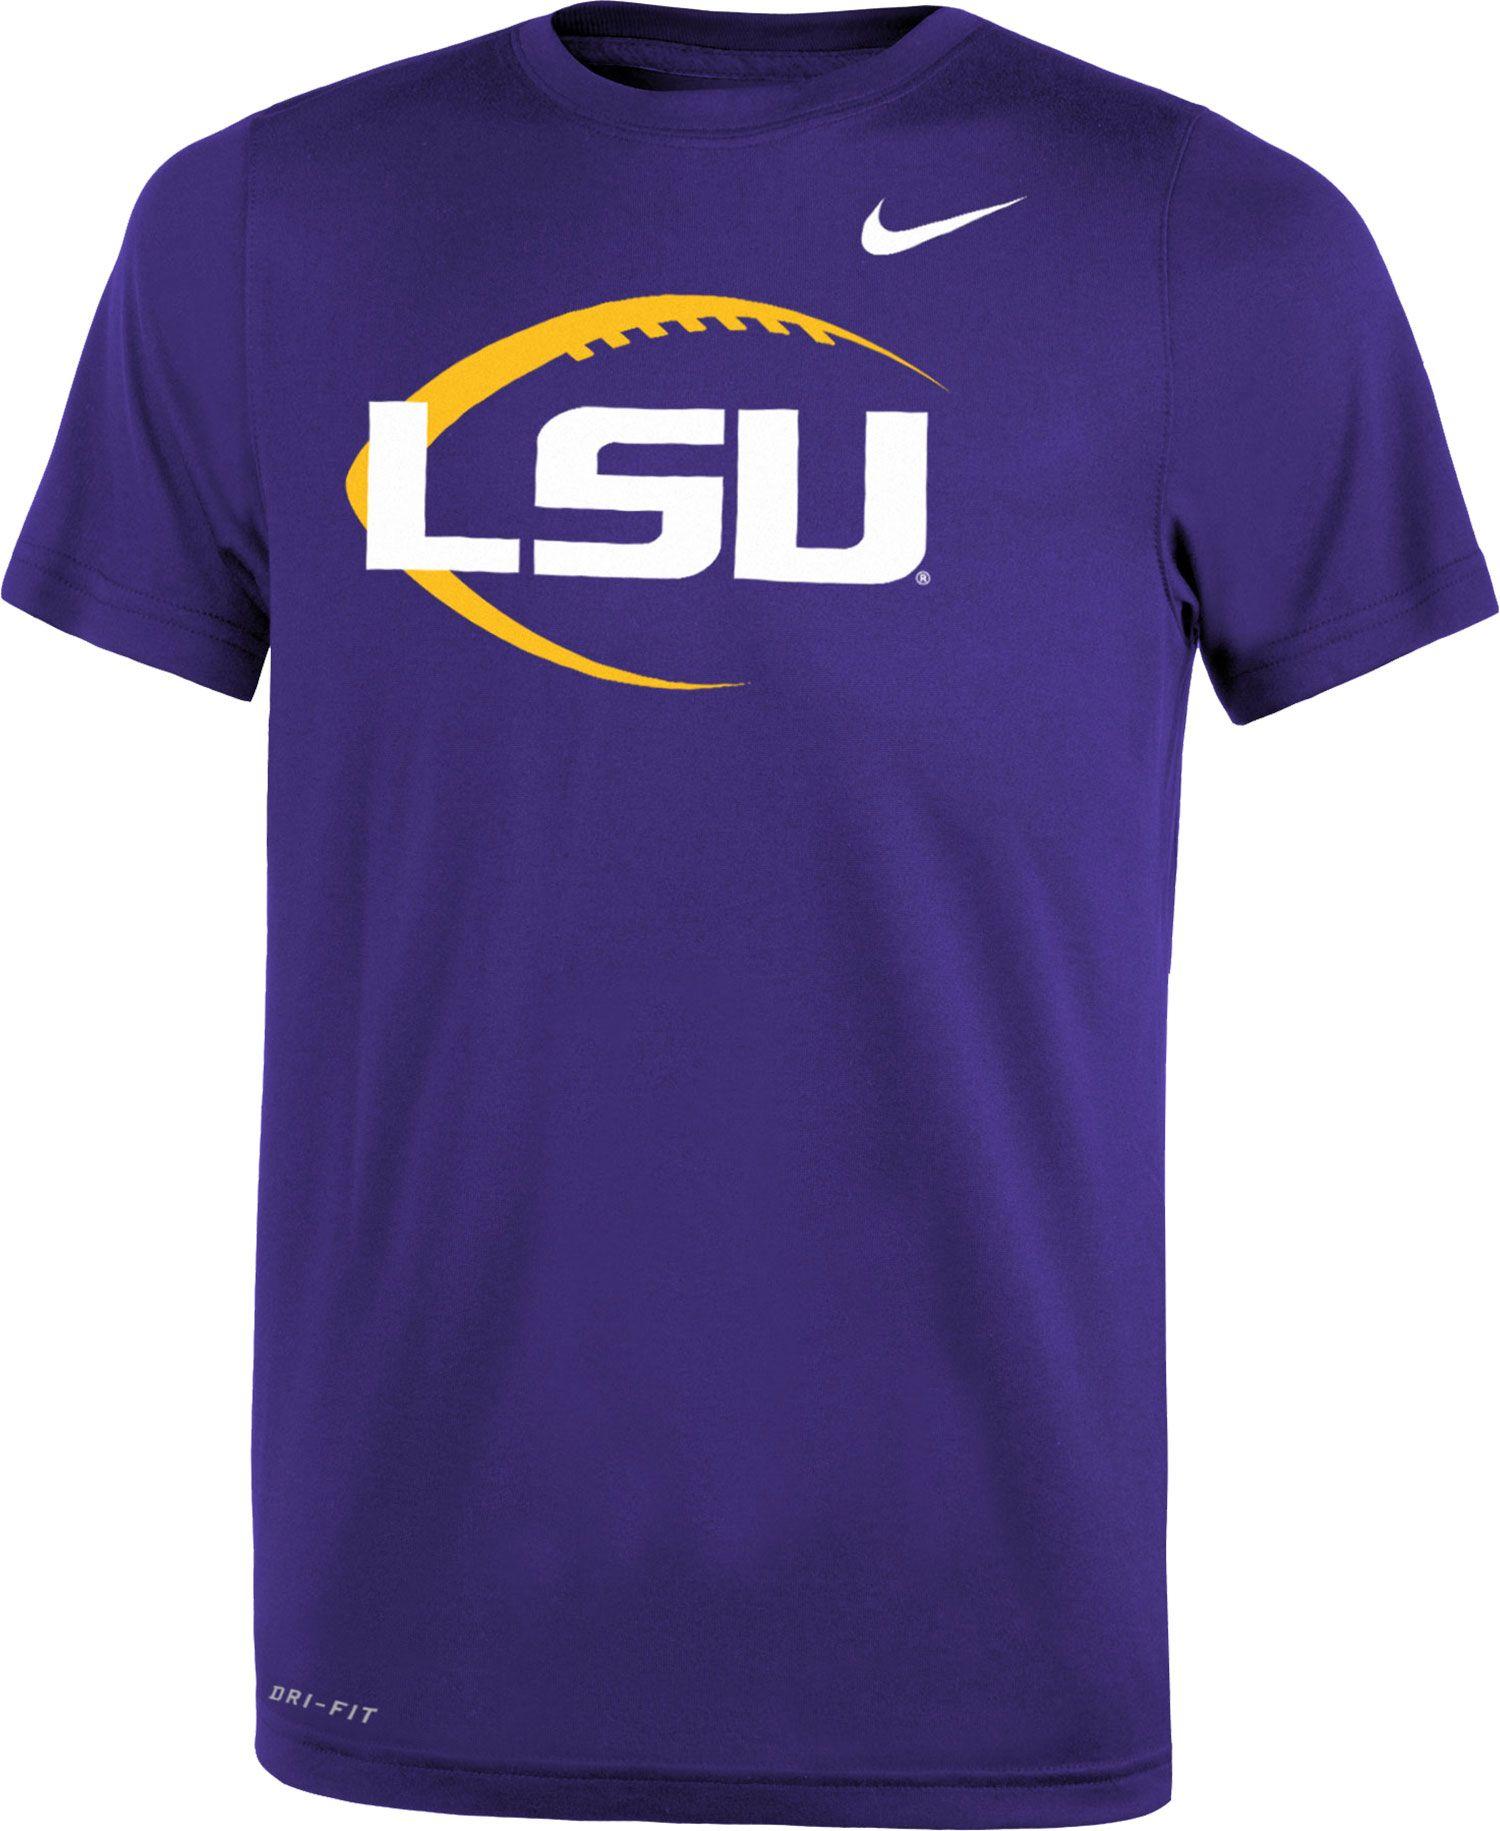 Nike Youth LSU Tigers Purple Football Icon Legend T-Shirt. 0:00. 0:00 /  0:00. noImageFound ???